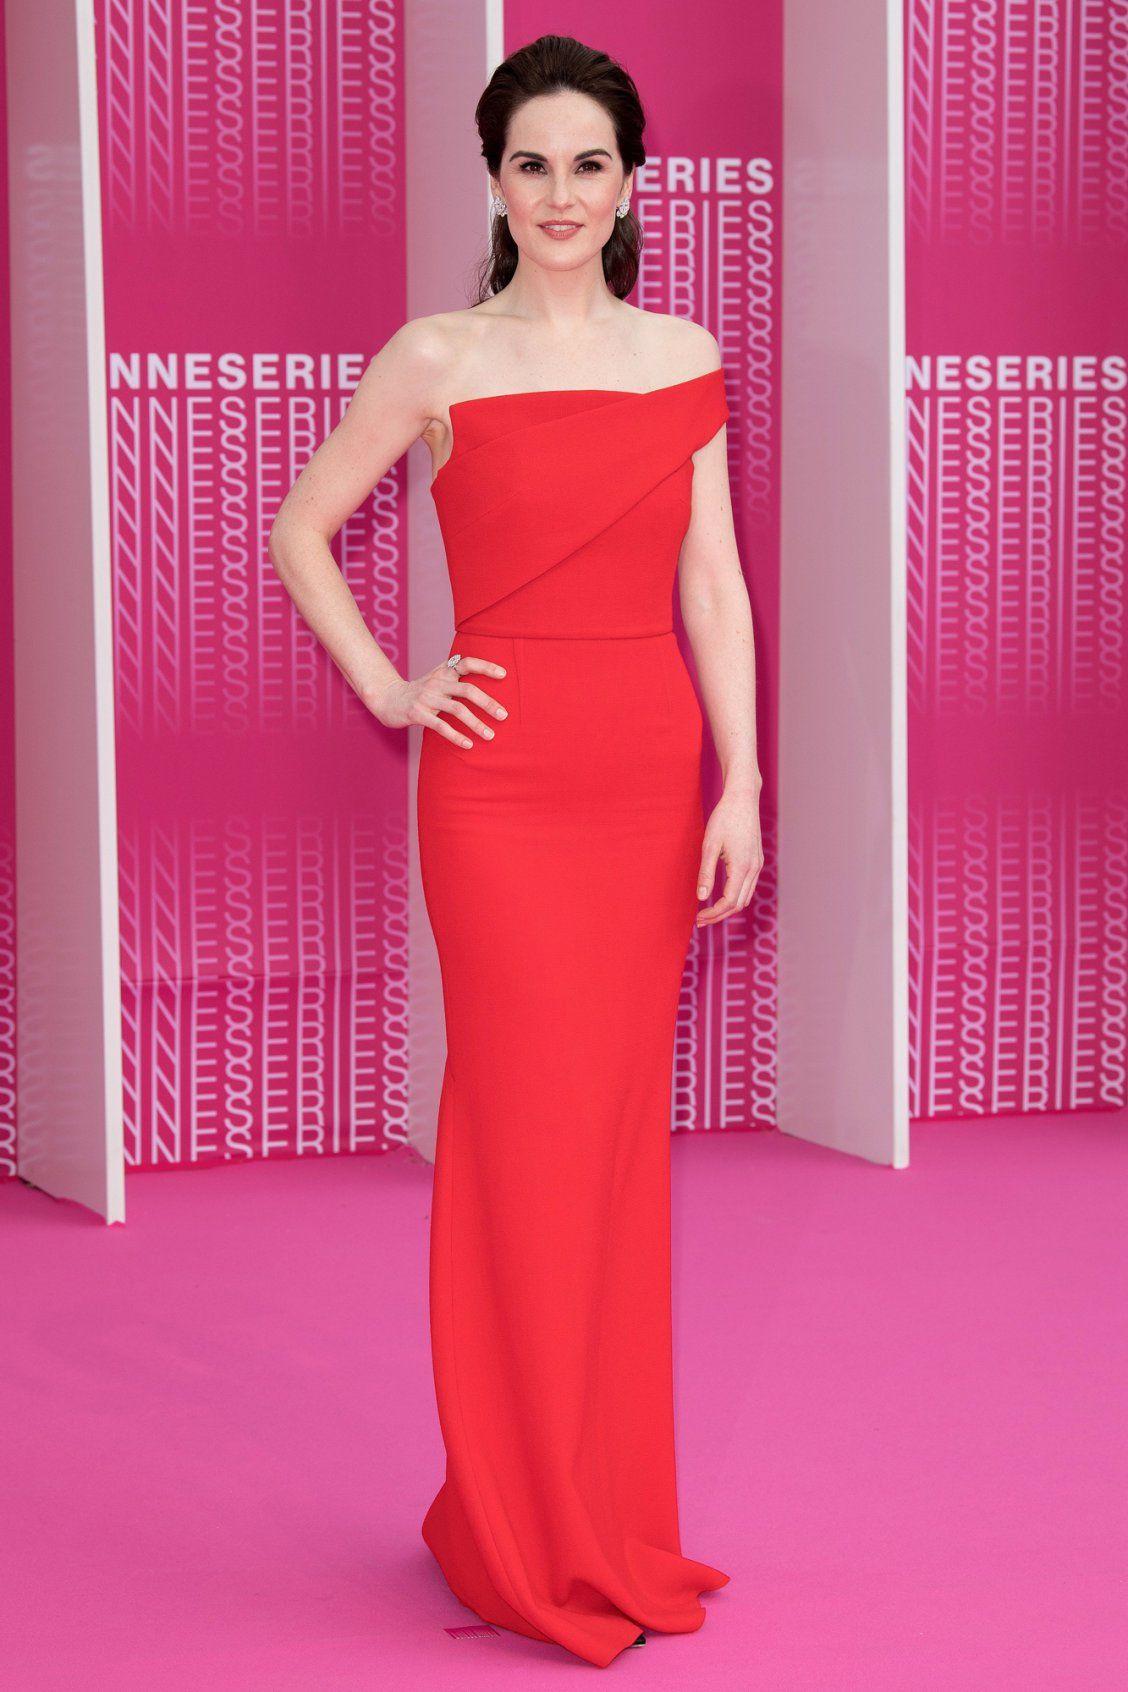 da67ed760d21 Karlie Kloss  Feminine Baby Pink Dress - and More Celebrity Outfits ...